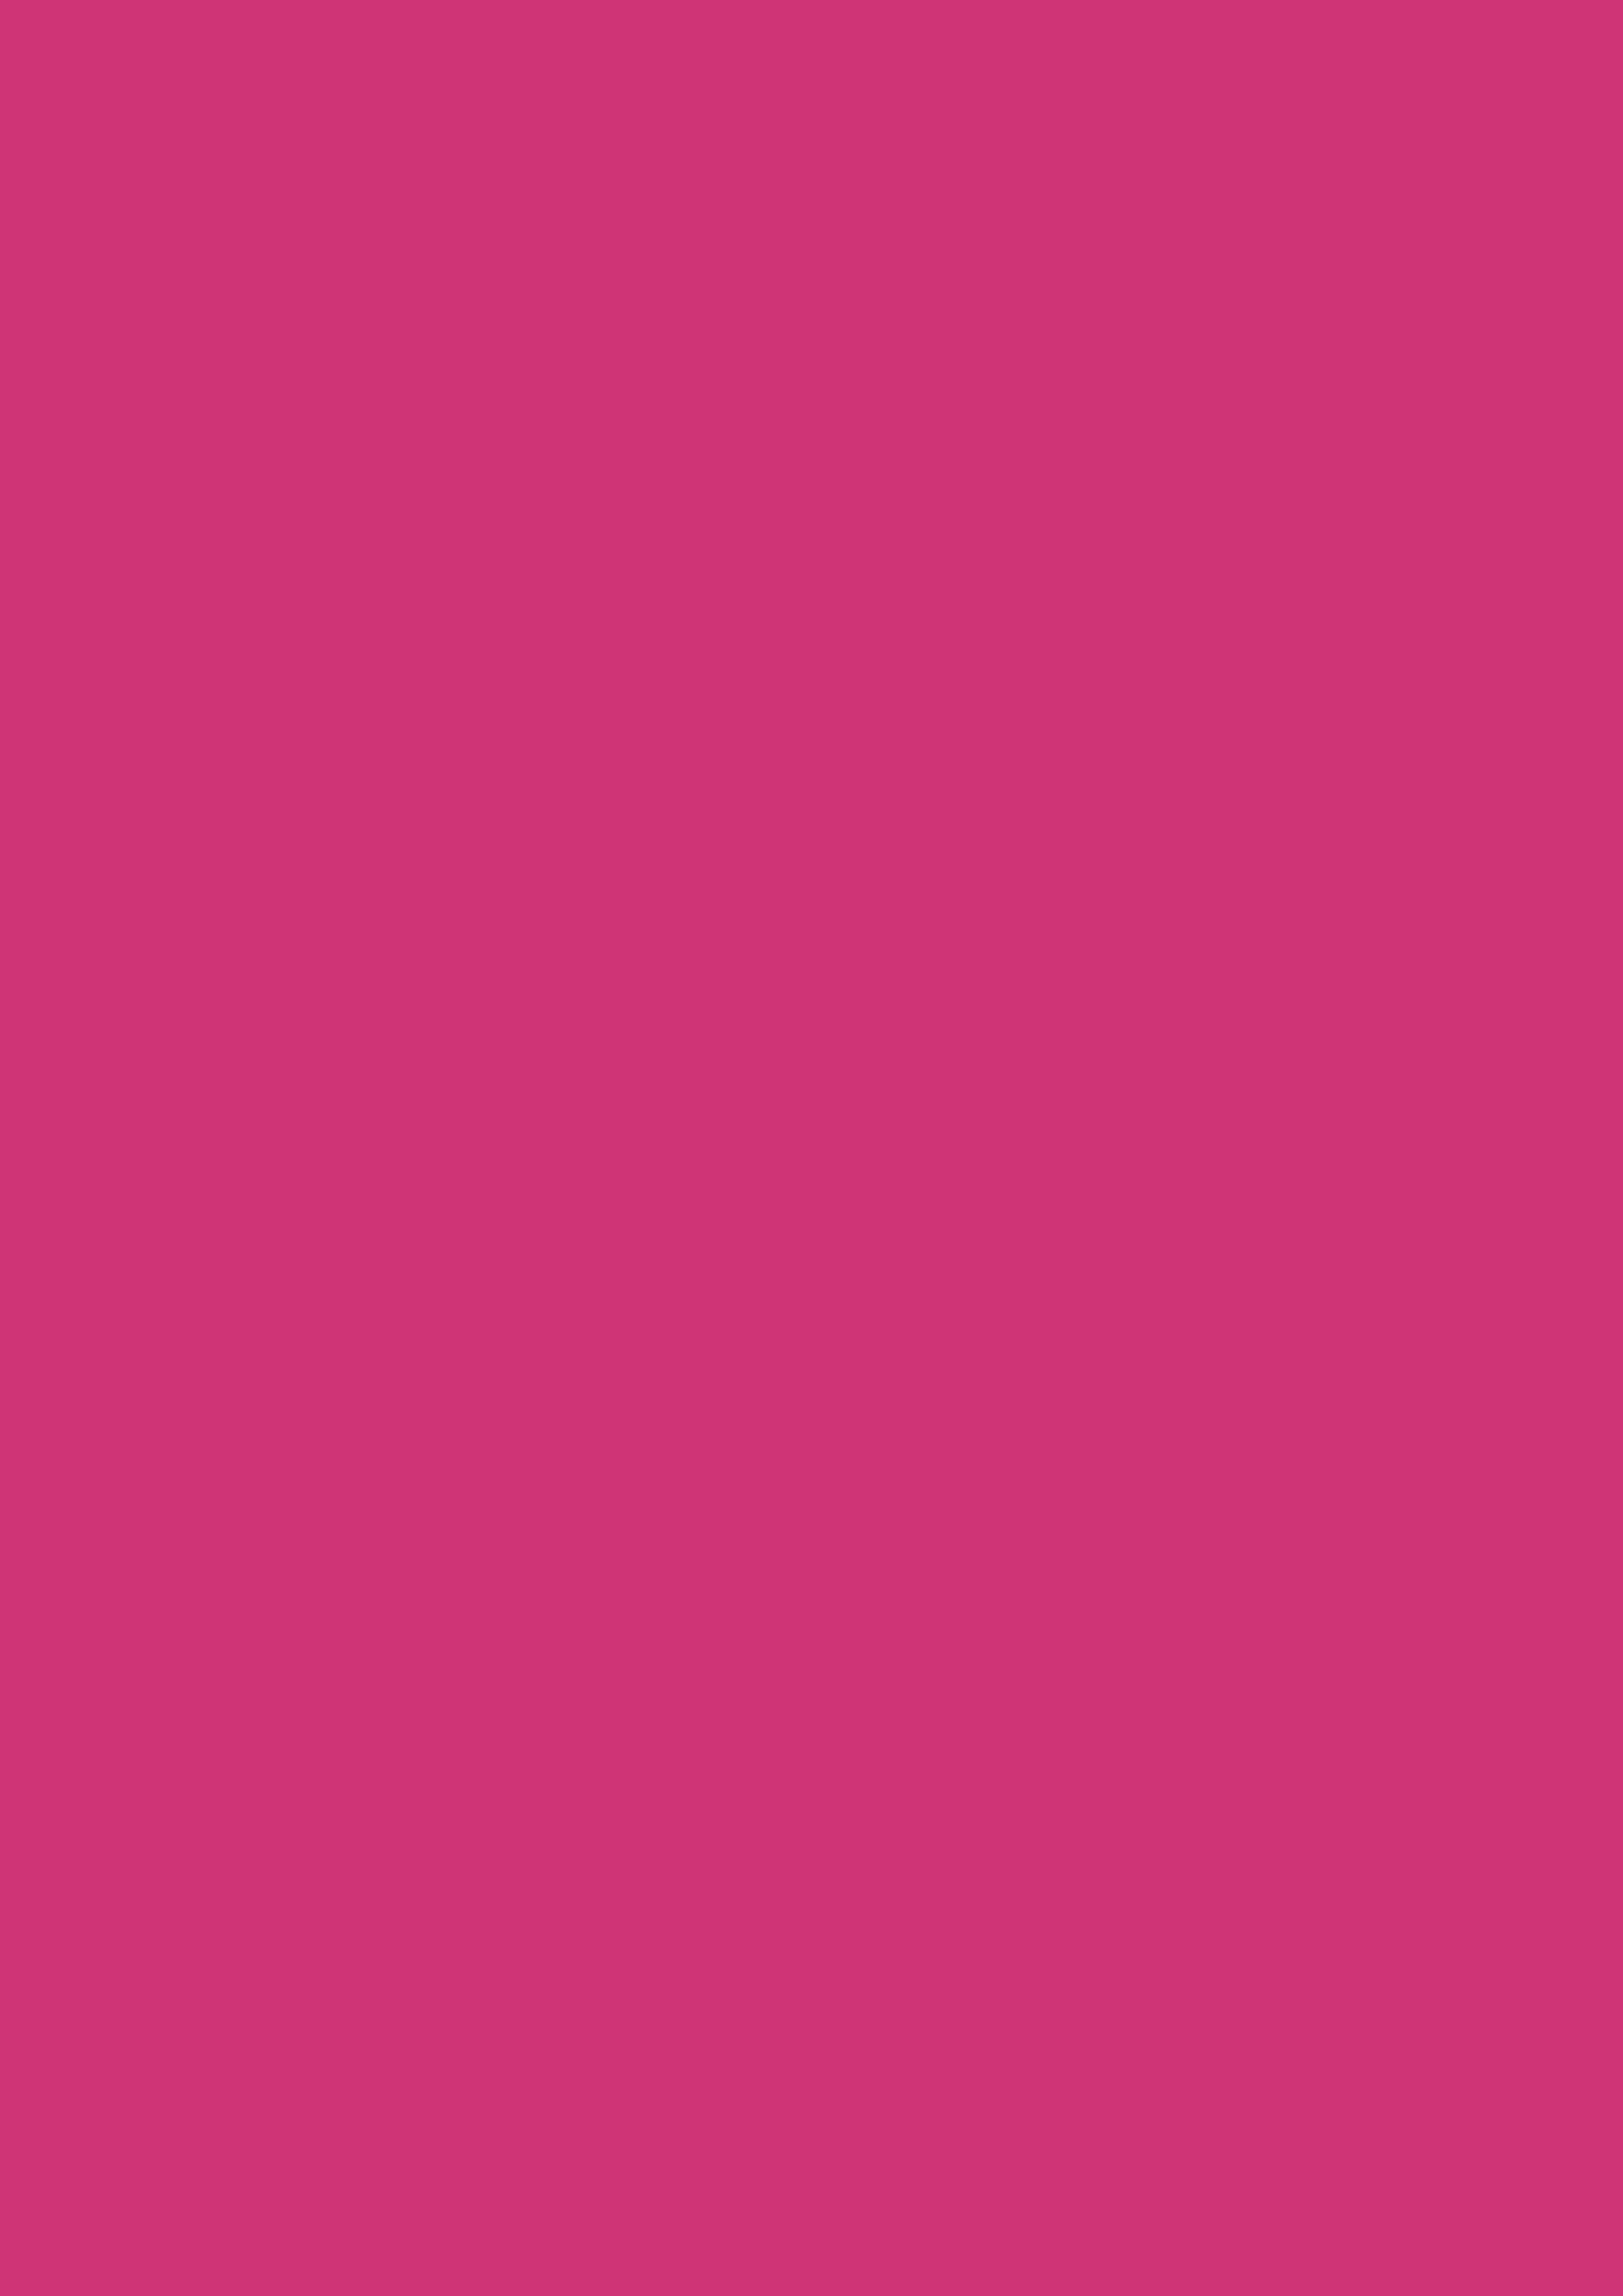 2480x3508 Telemagenta Solid Color Background